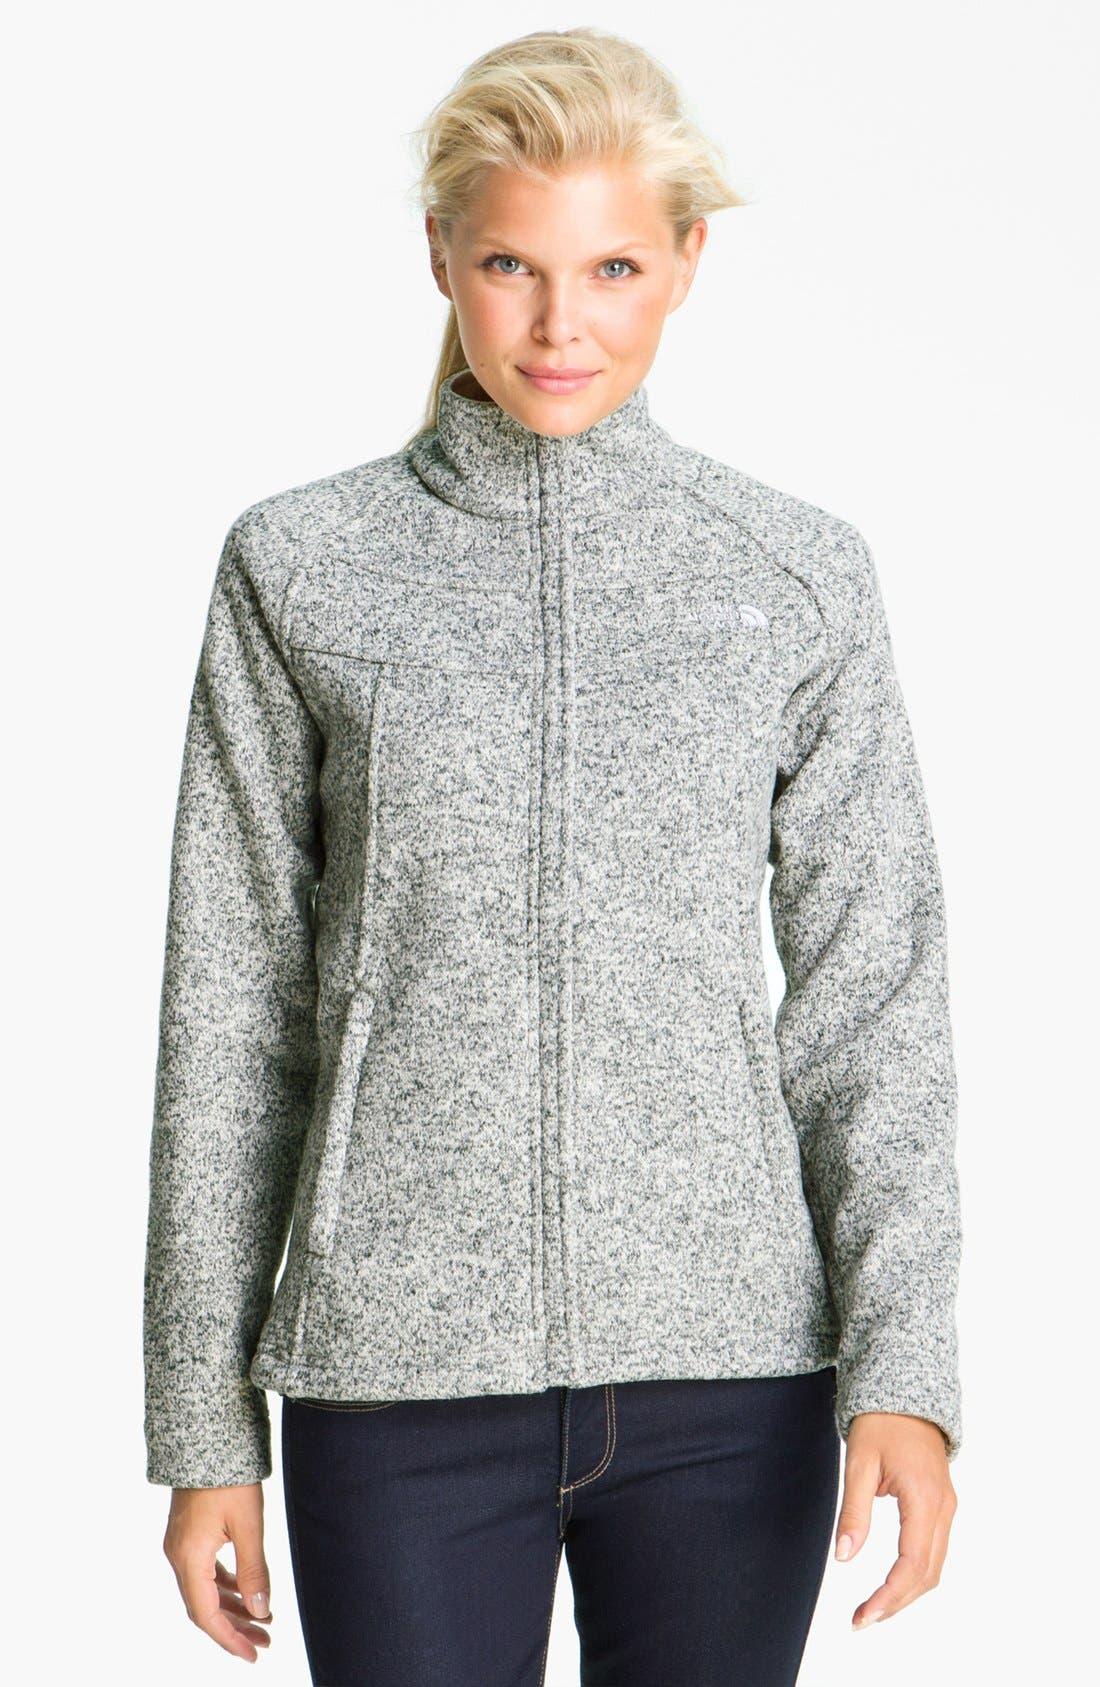 Main Image - The North Face 'Indi' Fleece Jacket